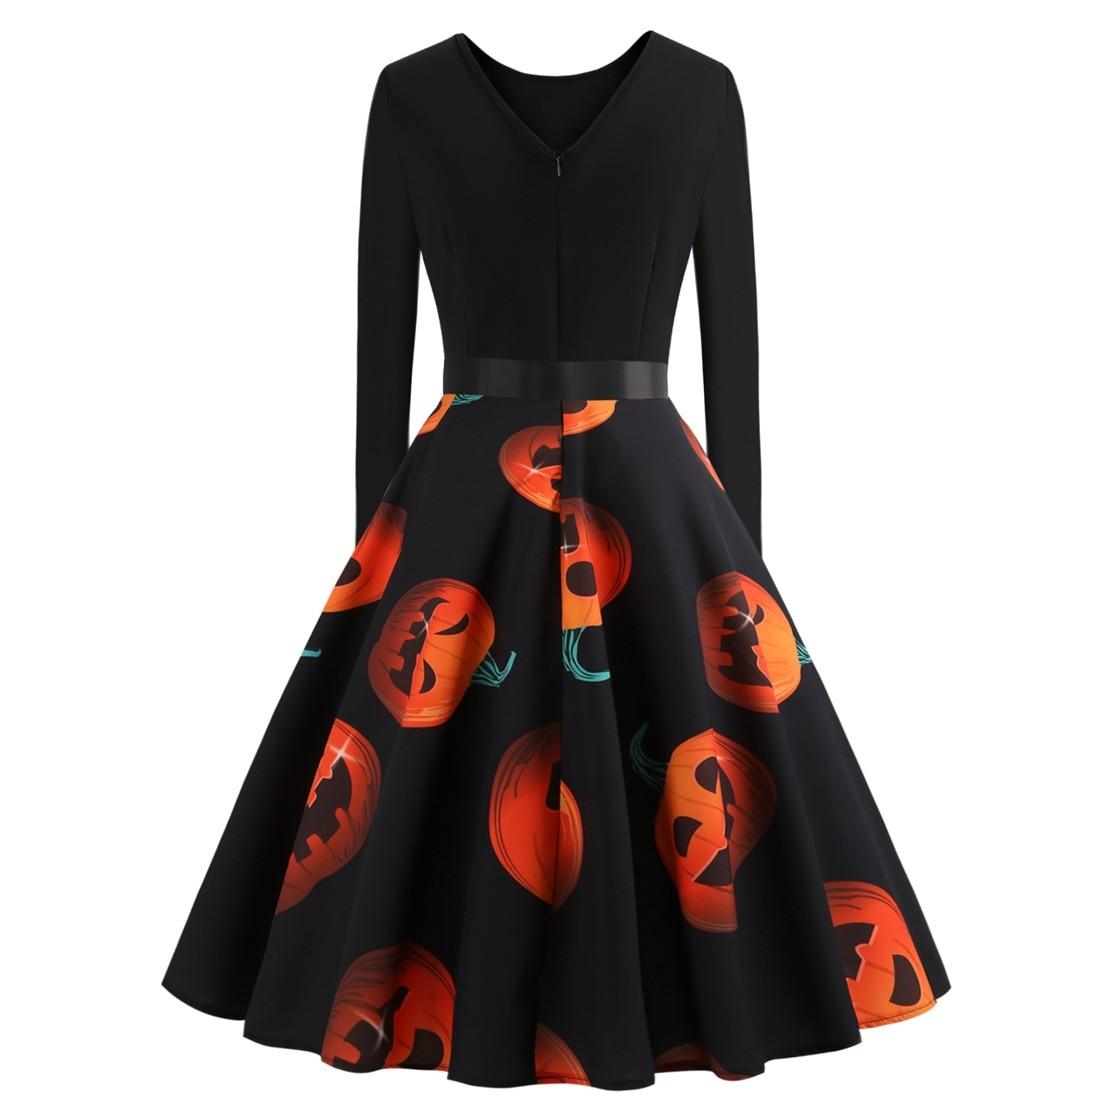 women dress new fall halloween festivals classics comfort elegance 2019 fashion ladies female womens clothing dresses lady in Dresses from Women 39 s Clothing